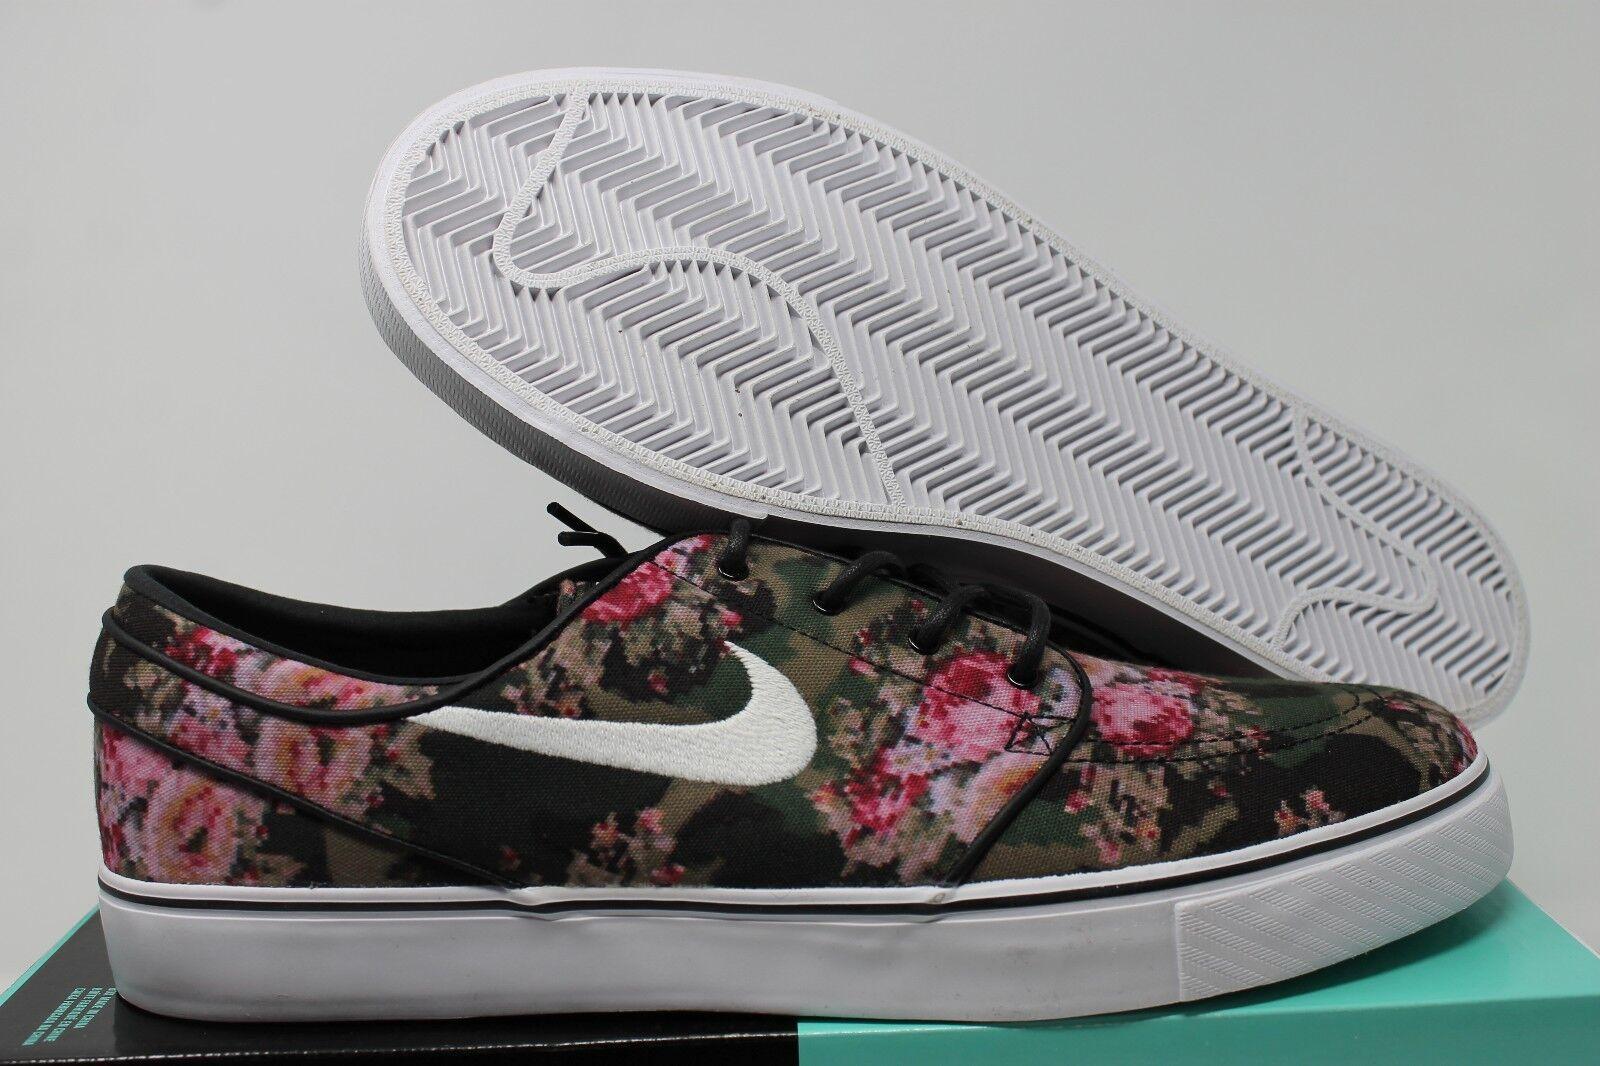 Nike SB Zoom Stefan Janoski Premium Floral Digi Camo 482972-900 Size ... 9f3da62e707f